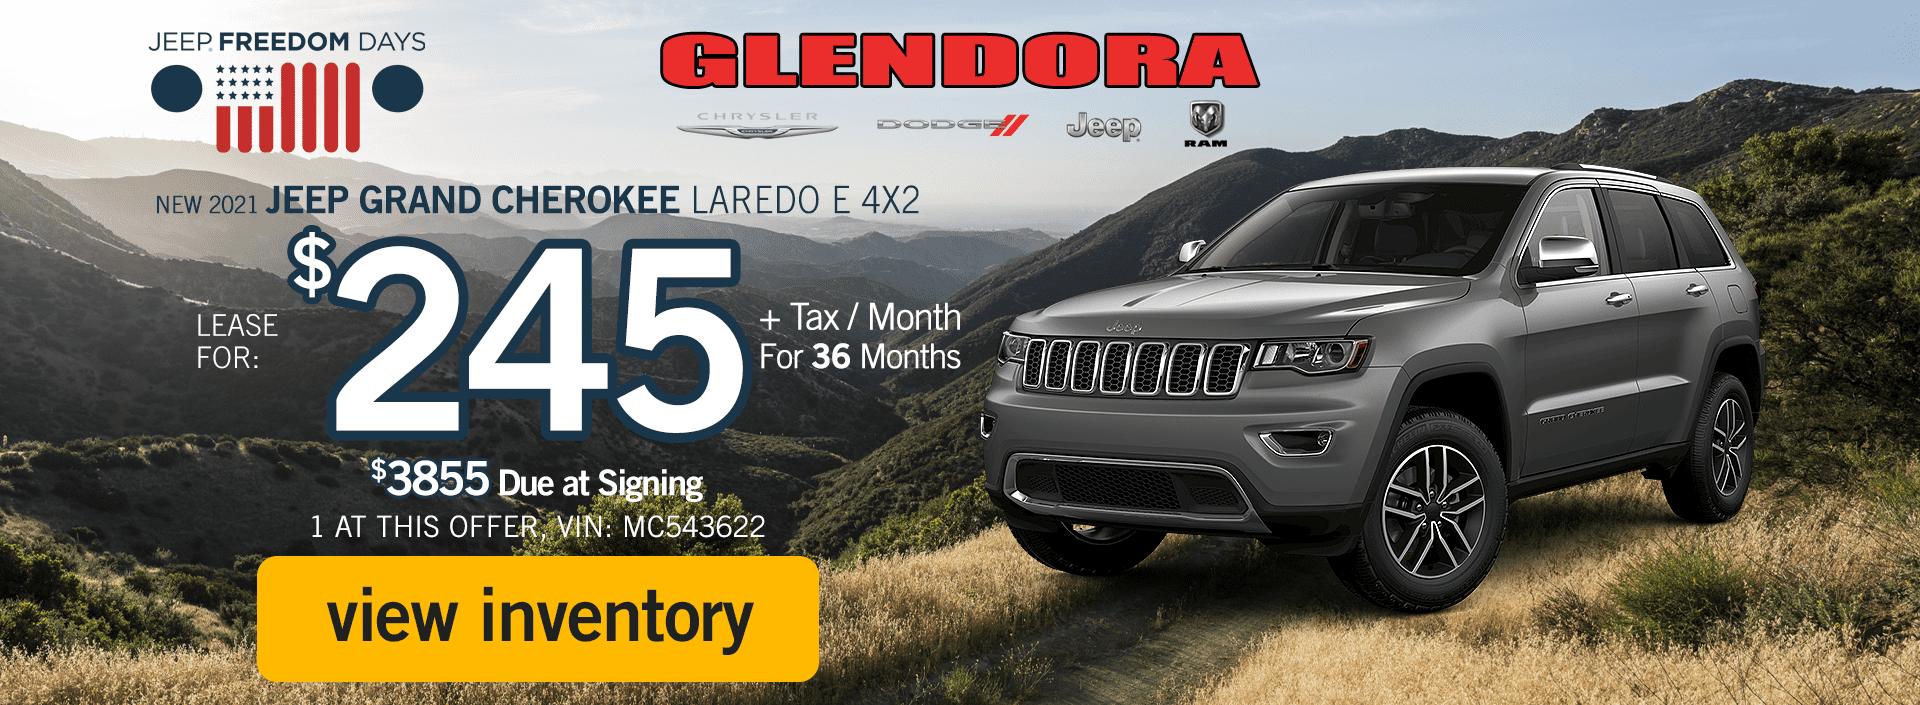 Glendora_CDJR_2021_June_Jeep_Freedom_Sales_Event_Jeep_Grand_Cherokee